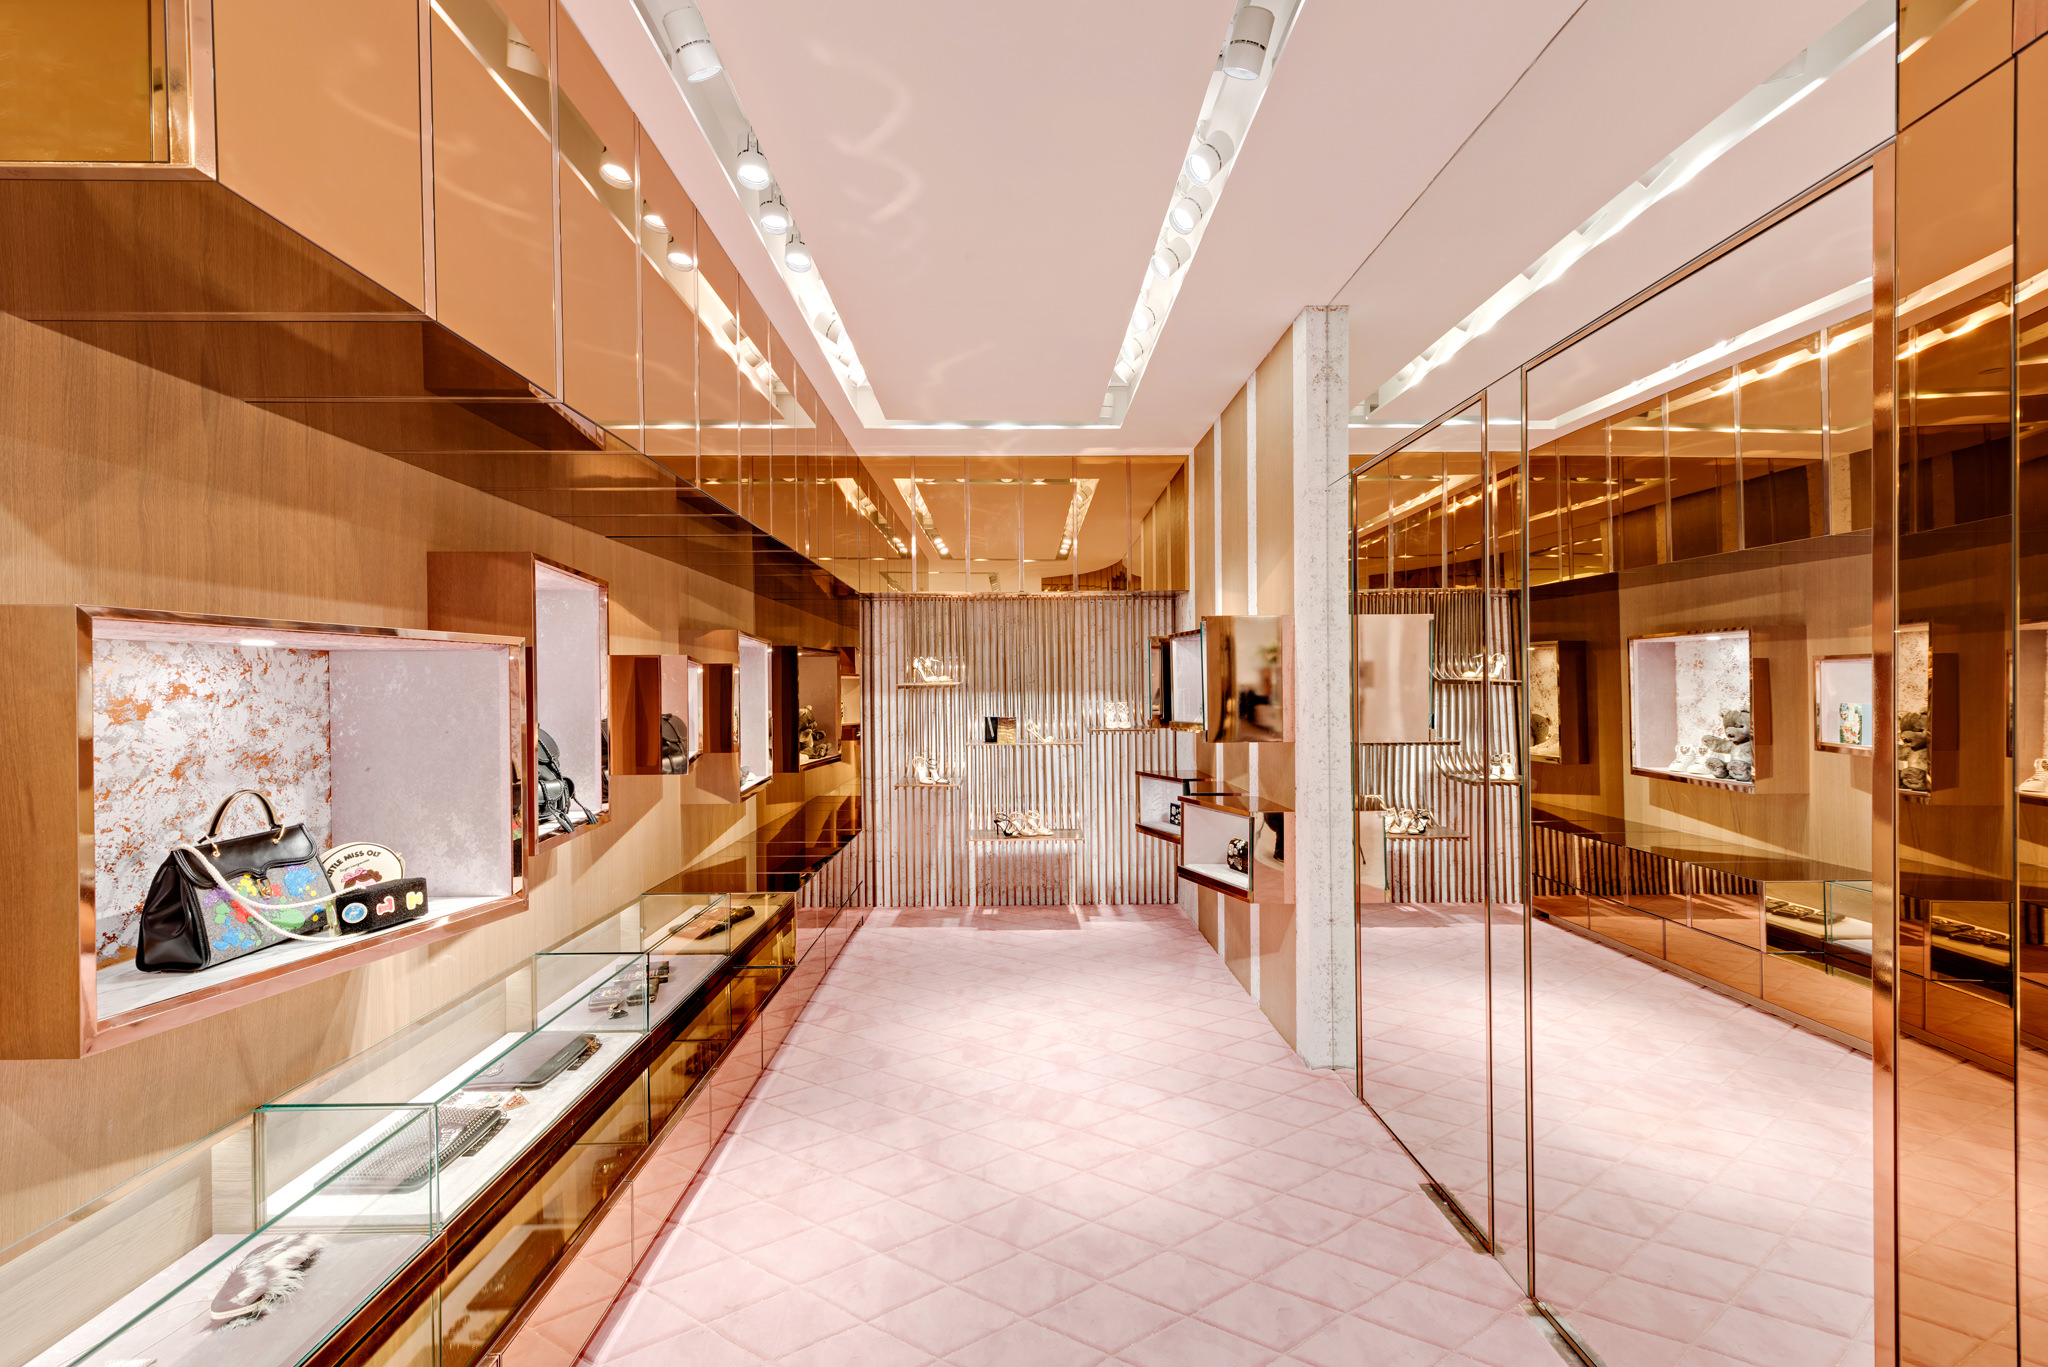 20161224 - Jacqueline - HCM - Commercial - Interior - Store - Retouch 0001.jpg